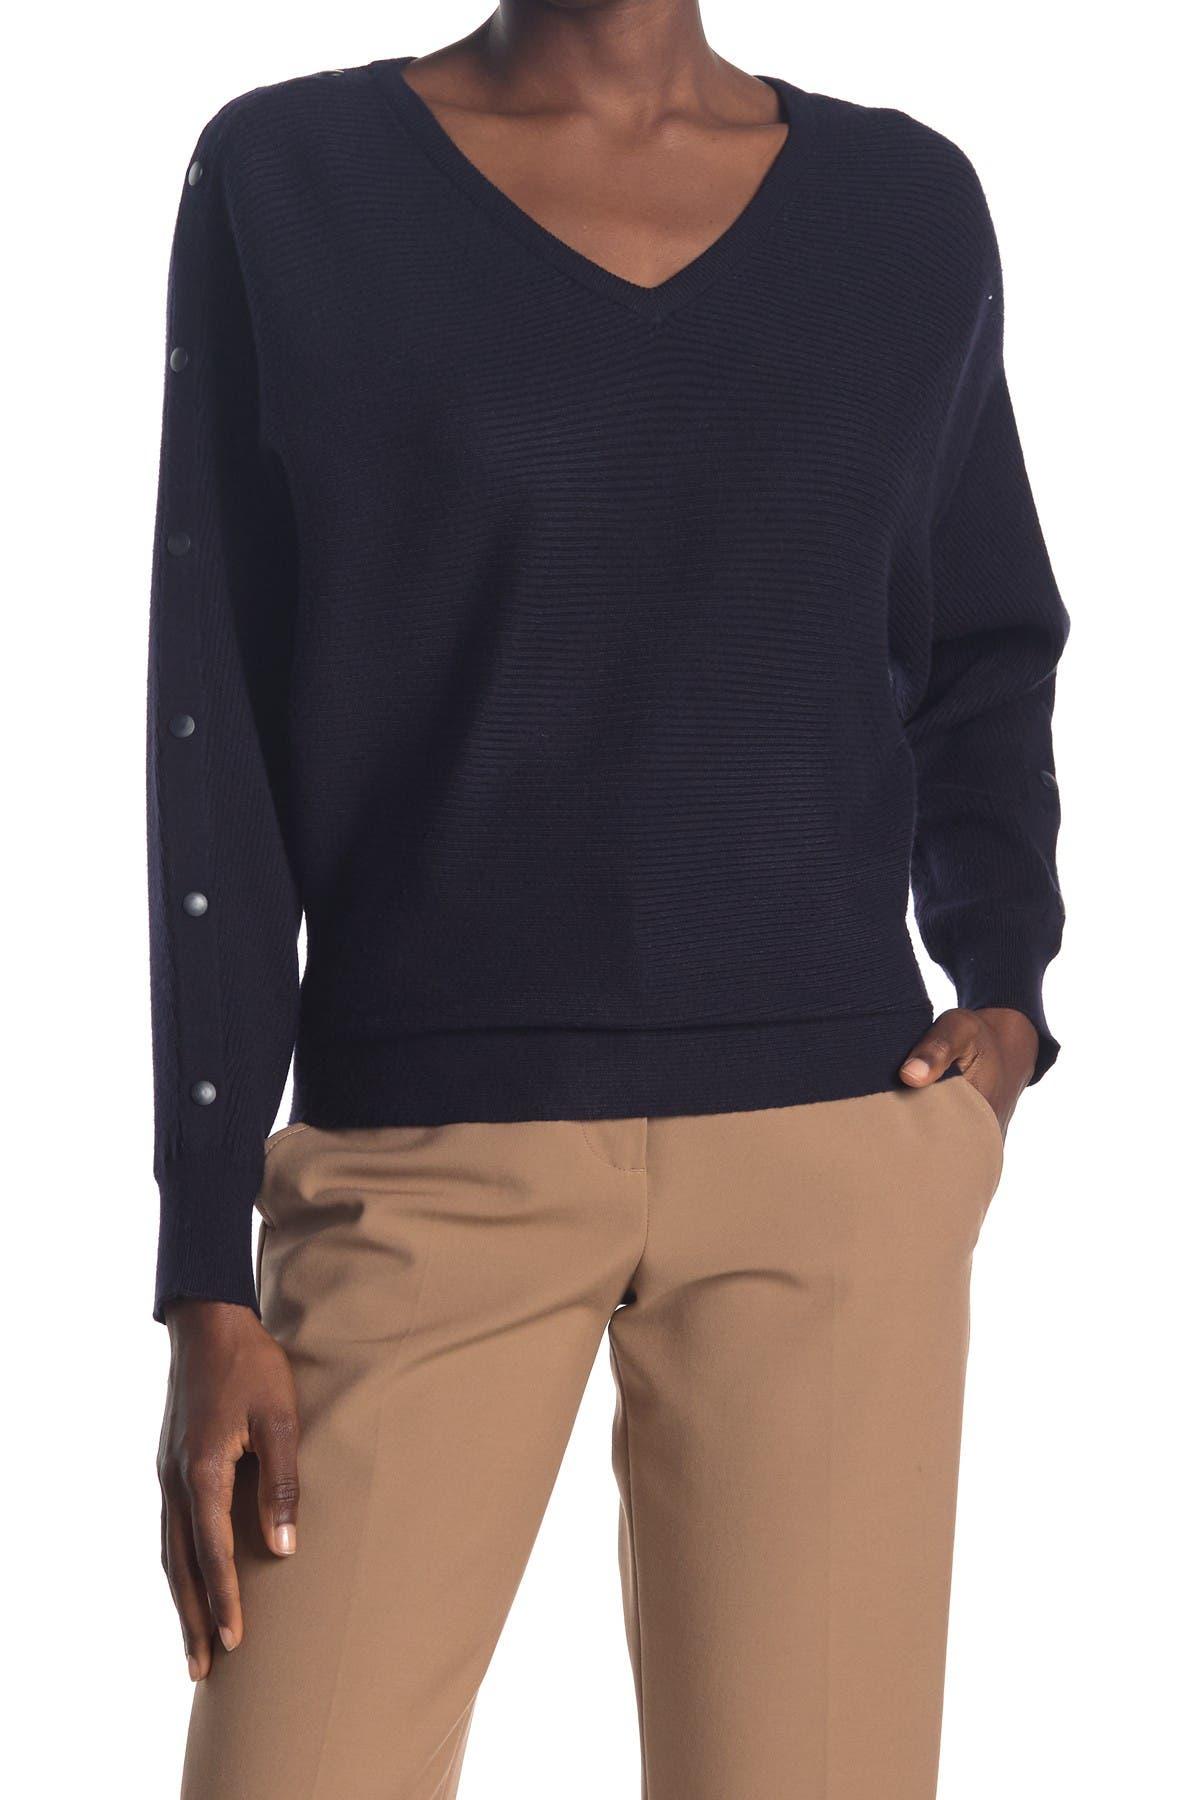 Image of T Tahari Dolman V-Neck Sweater